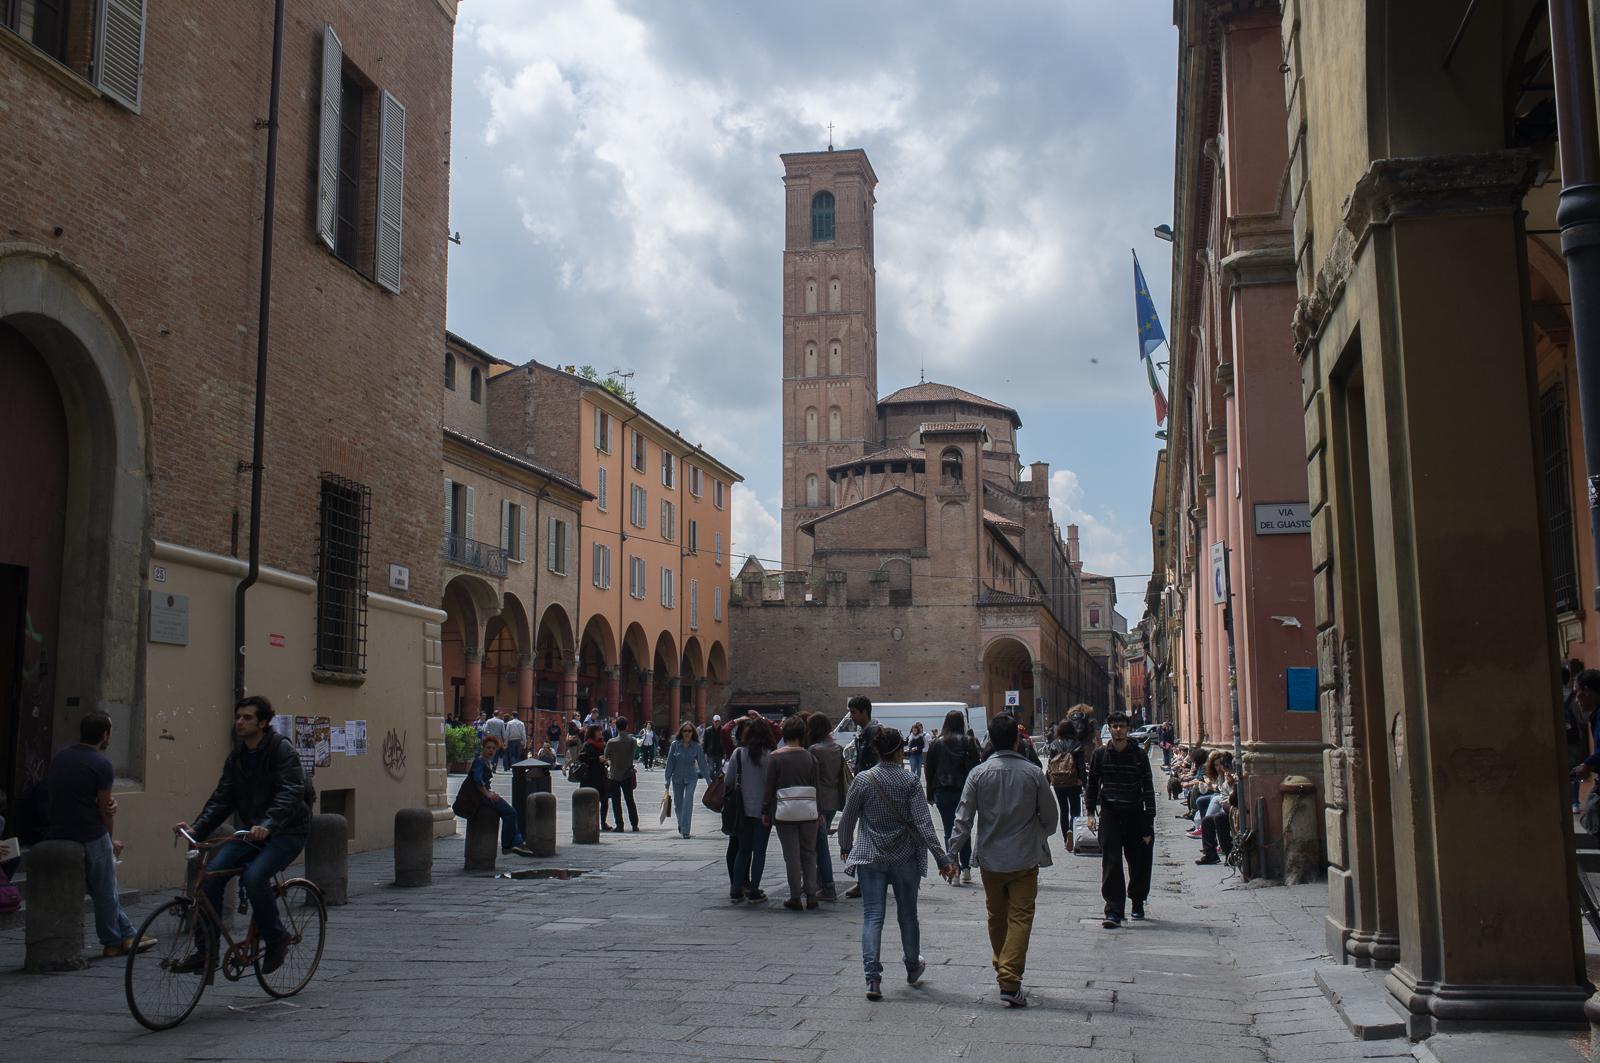 Via Zamboni, University area, Bologna